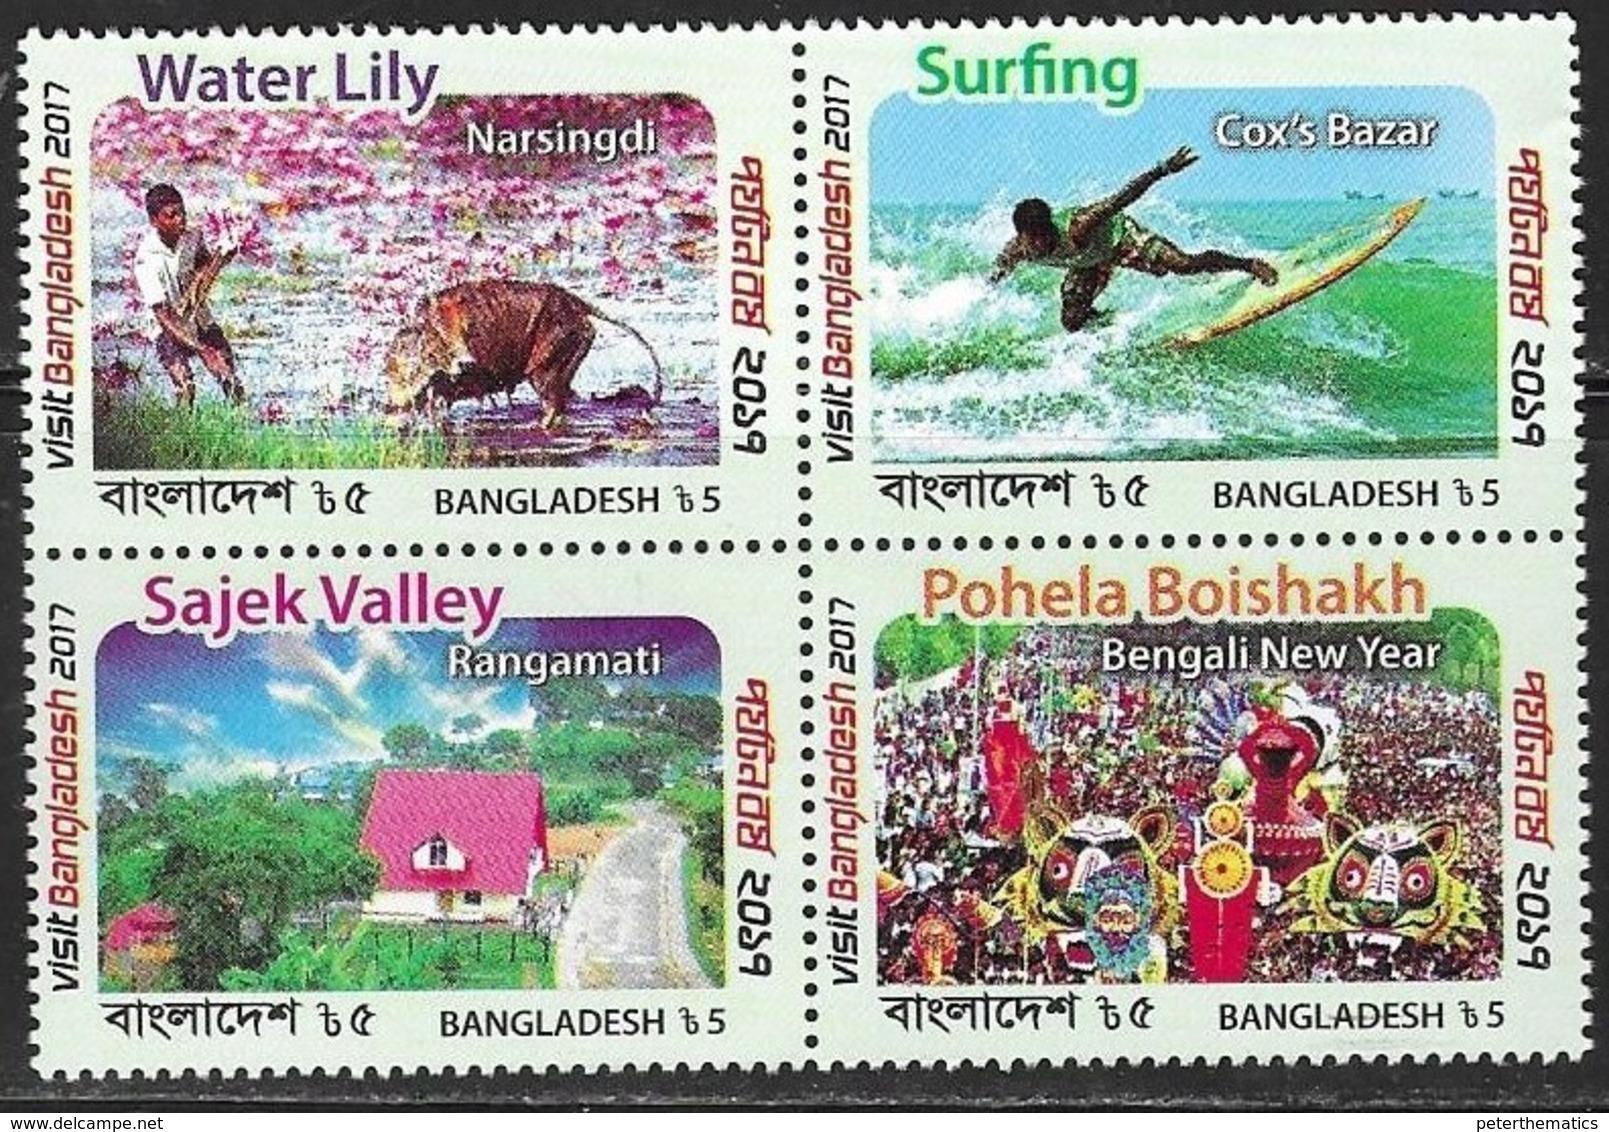 BANGLADESH , 2018, MNH, TOURISM, FESTIVALS, FAUNA, CATTLE, SURFING, BOATS, 4v - Holidays & Tourism